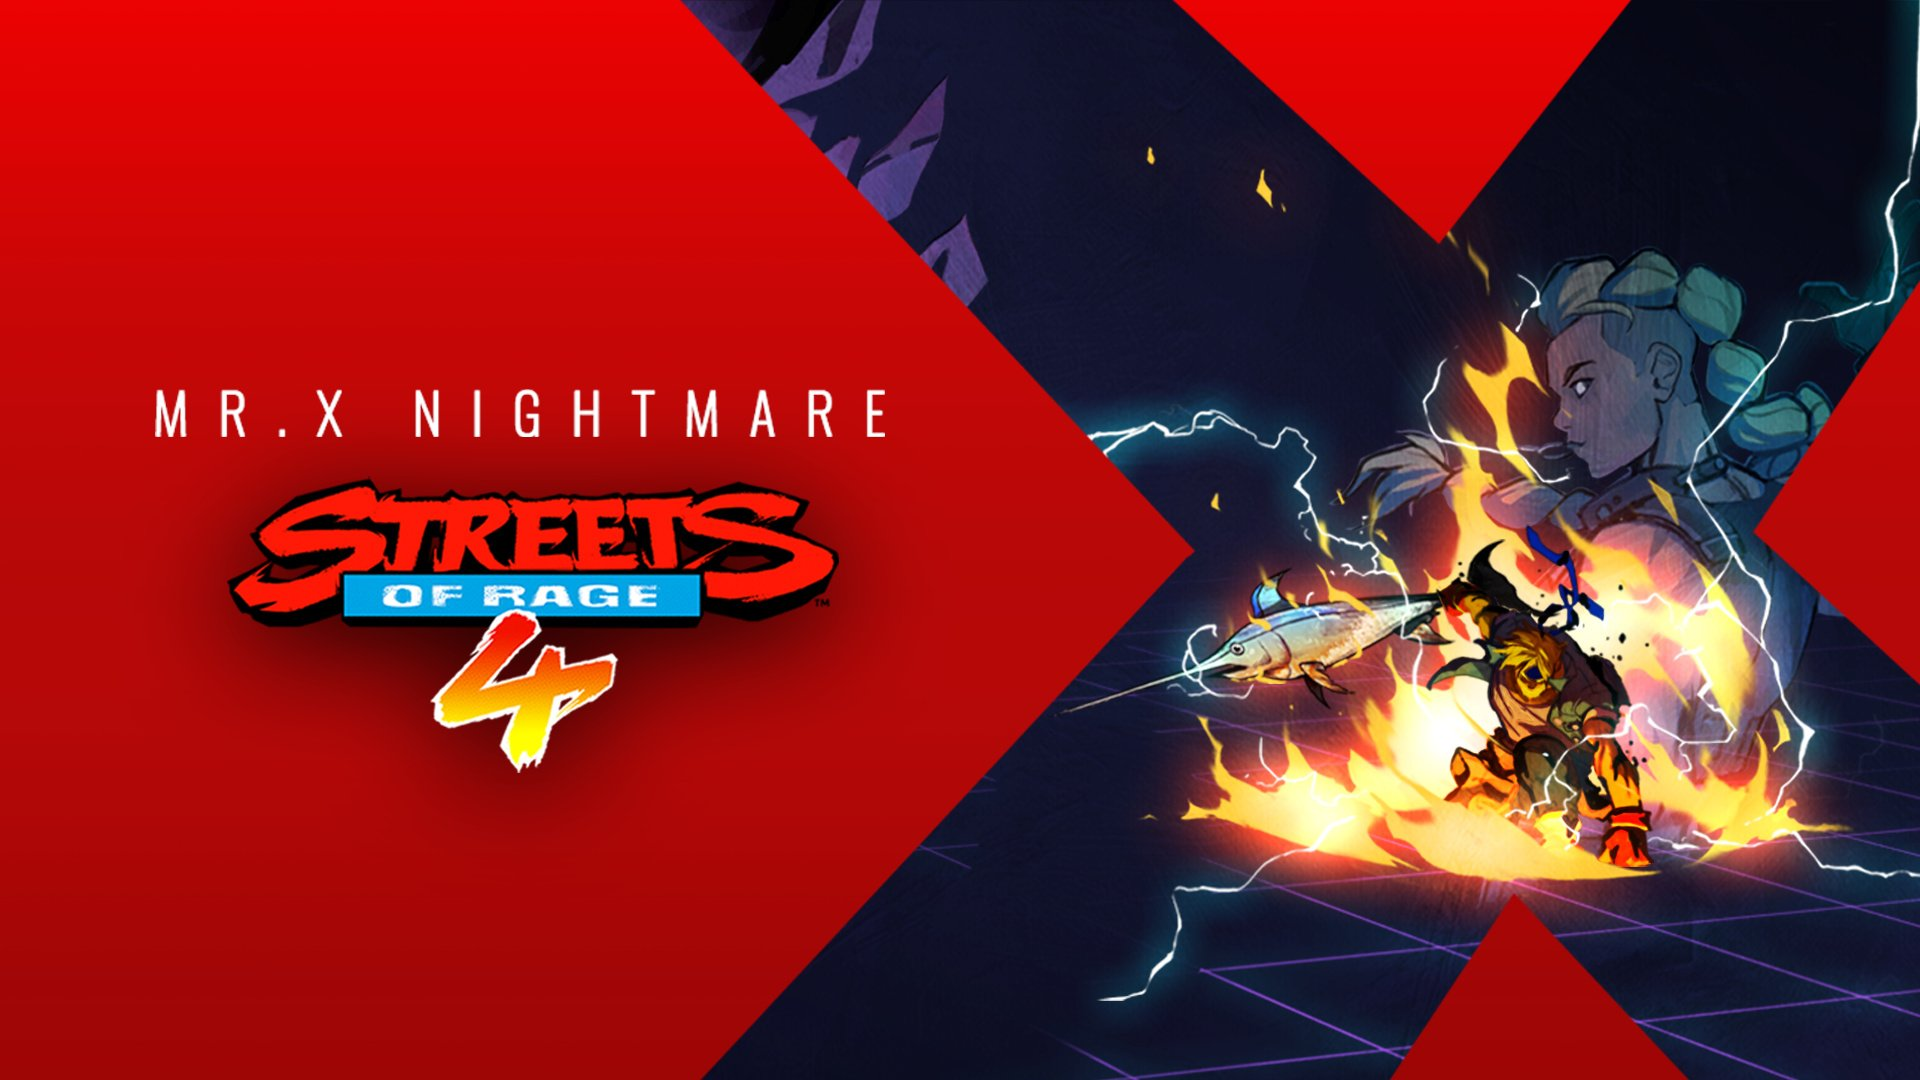 streets of rage 4 mr x nightmare dlc.original